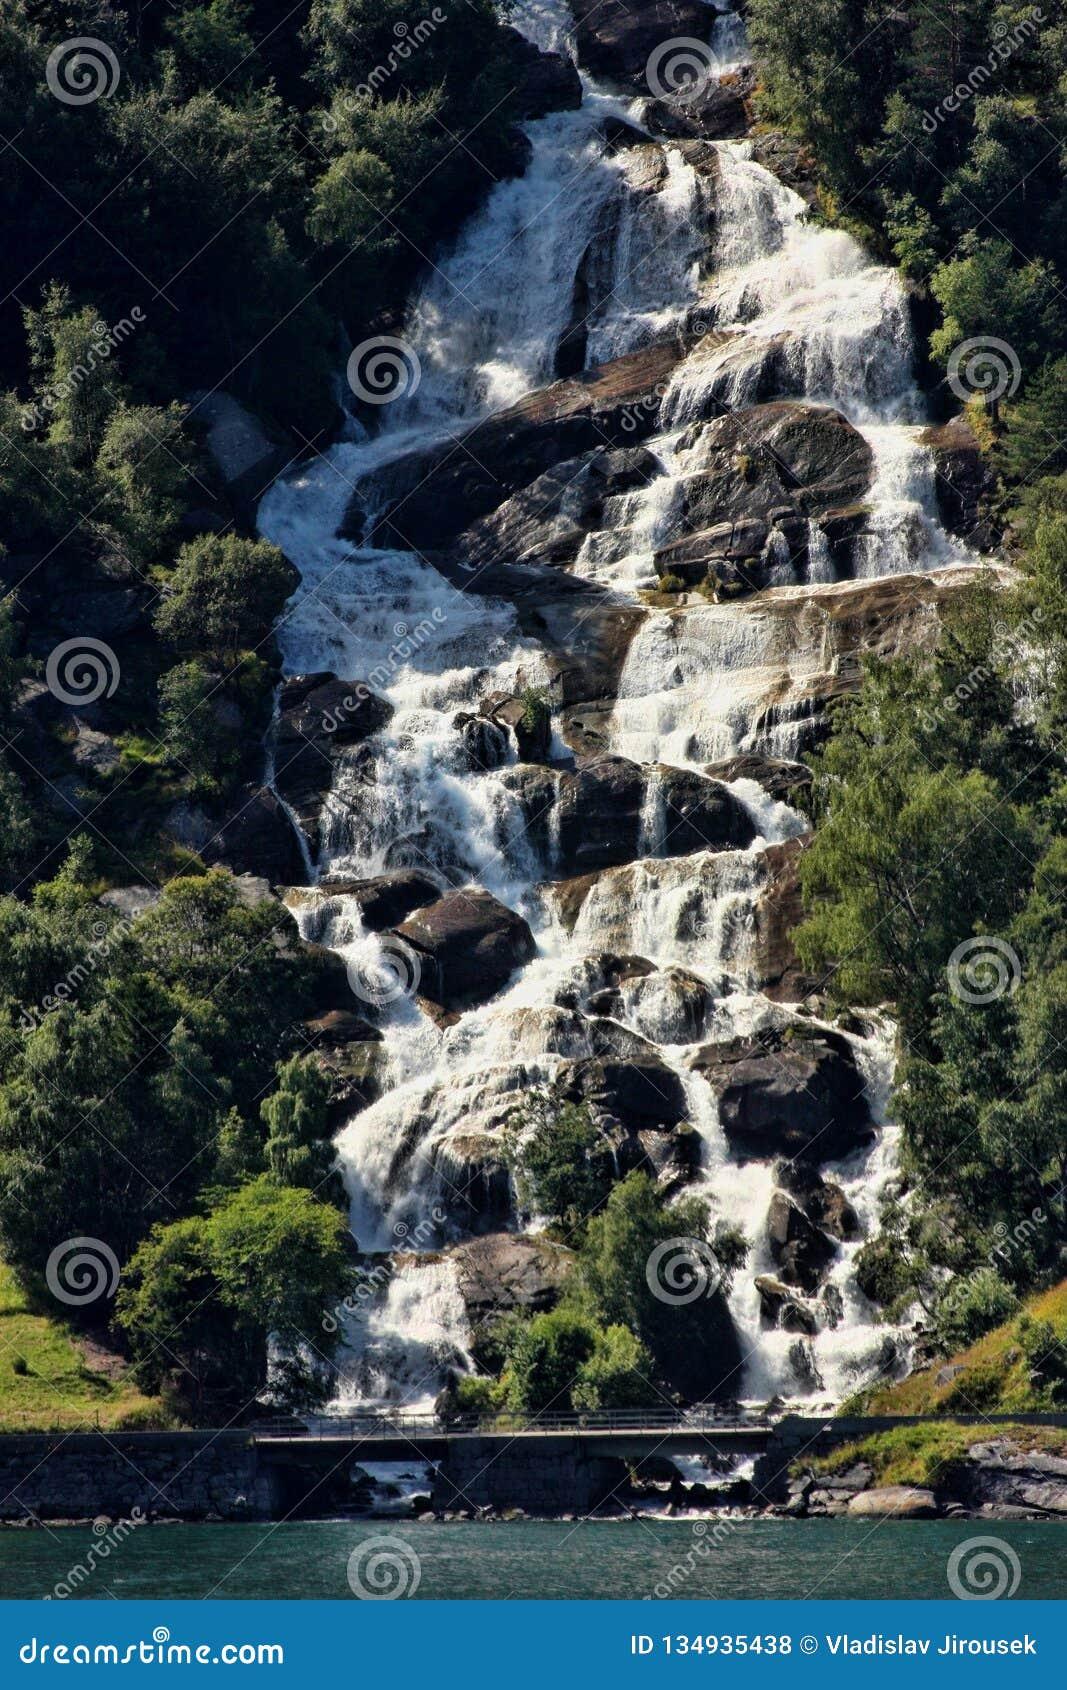 Hay centenares de cascadas hermosas en Escandinavia